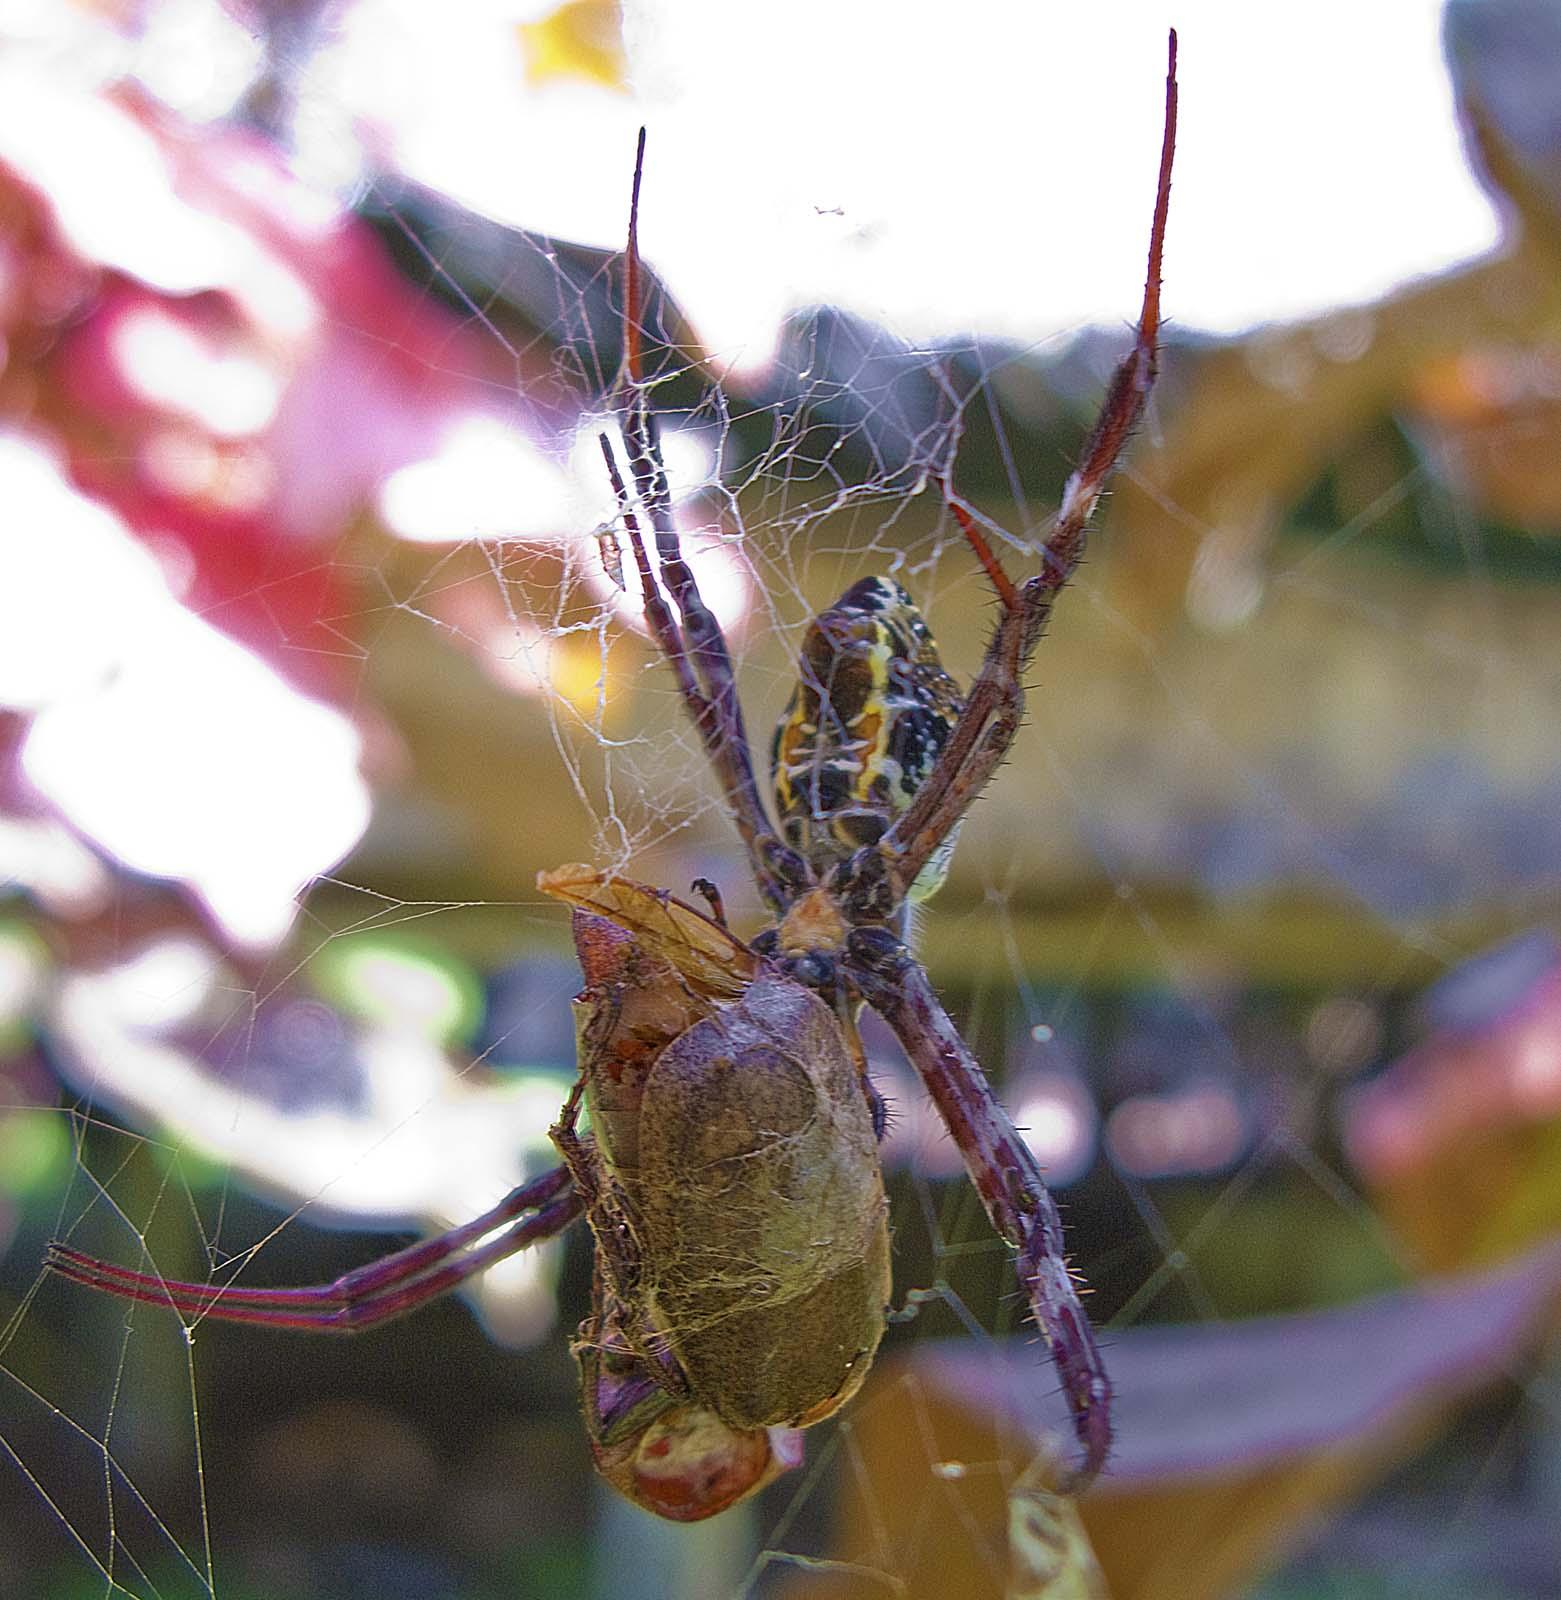 Lizards Eat Spiders Spider Eating a Huge Beetle